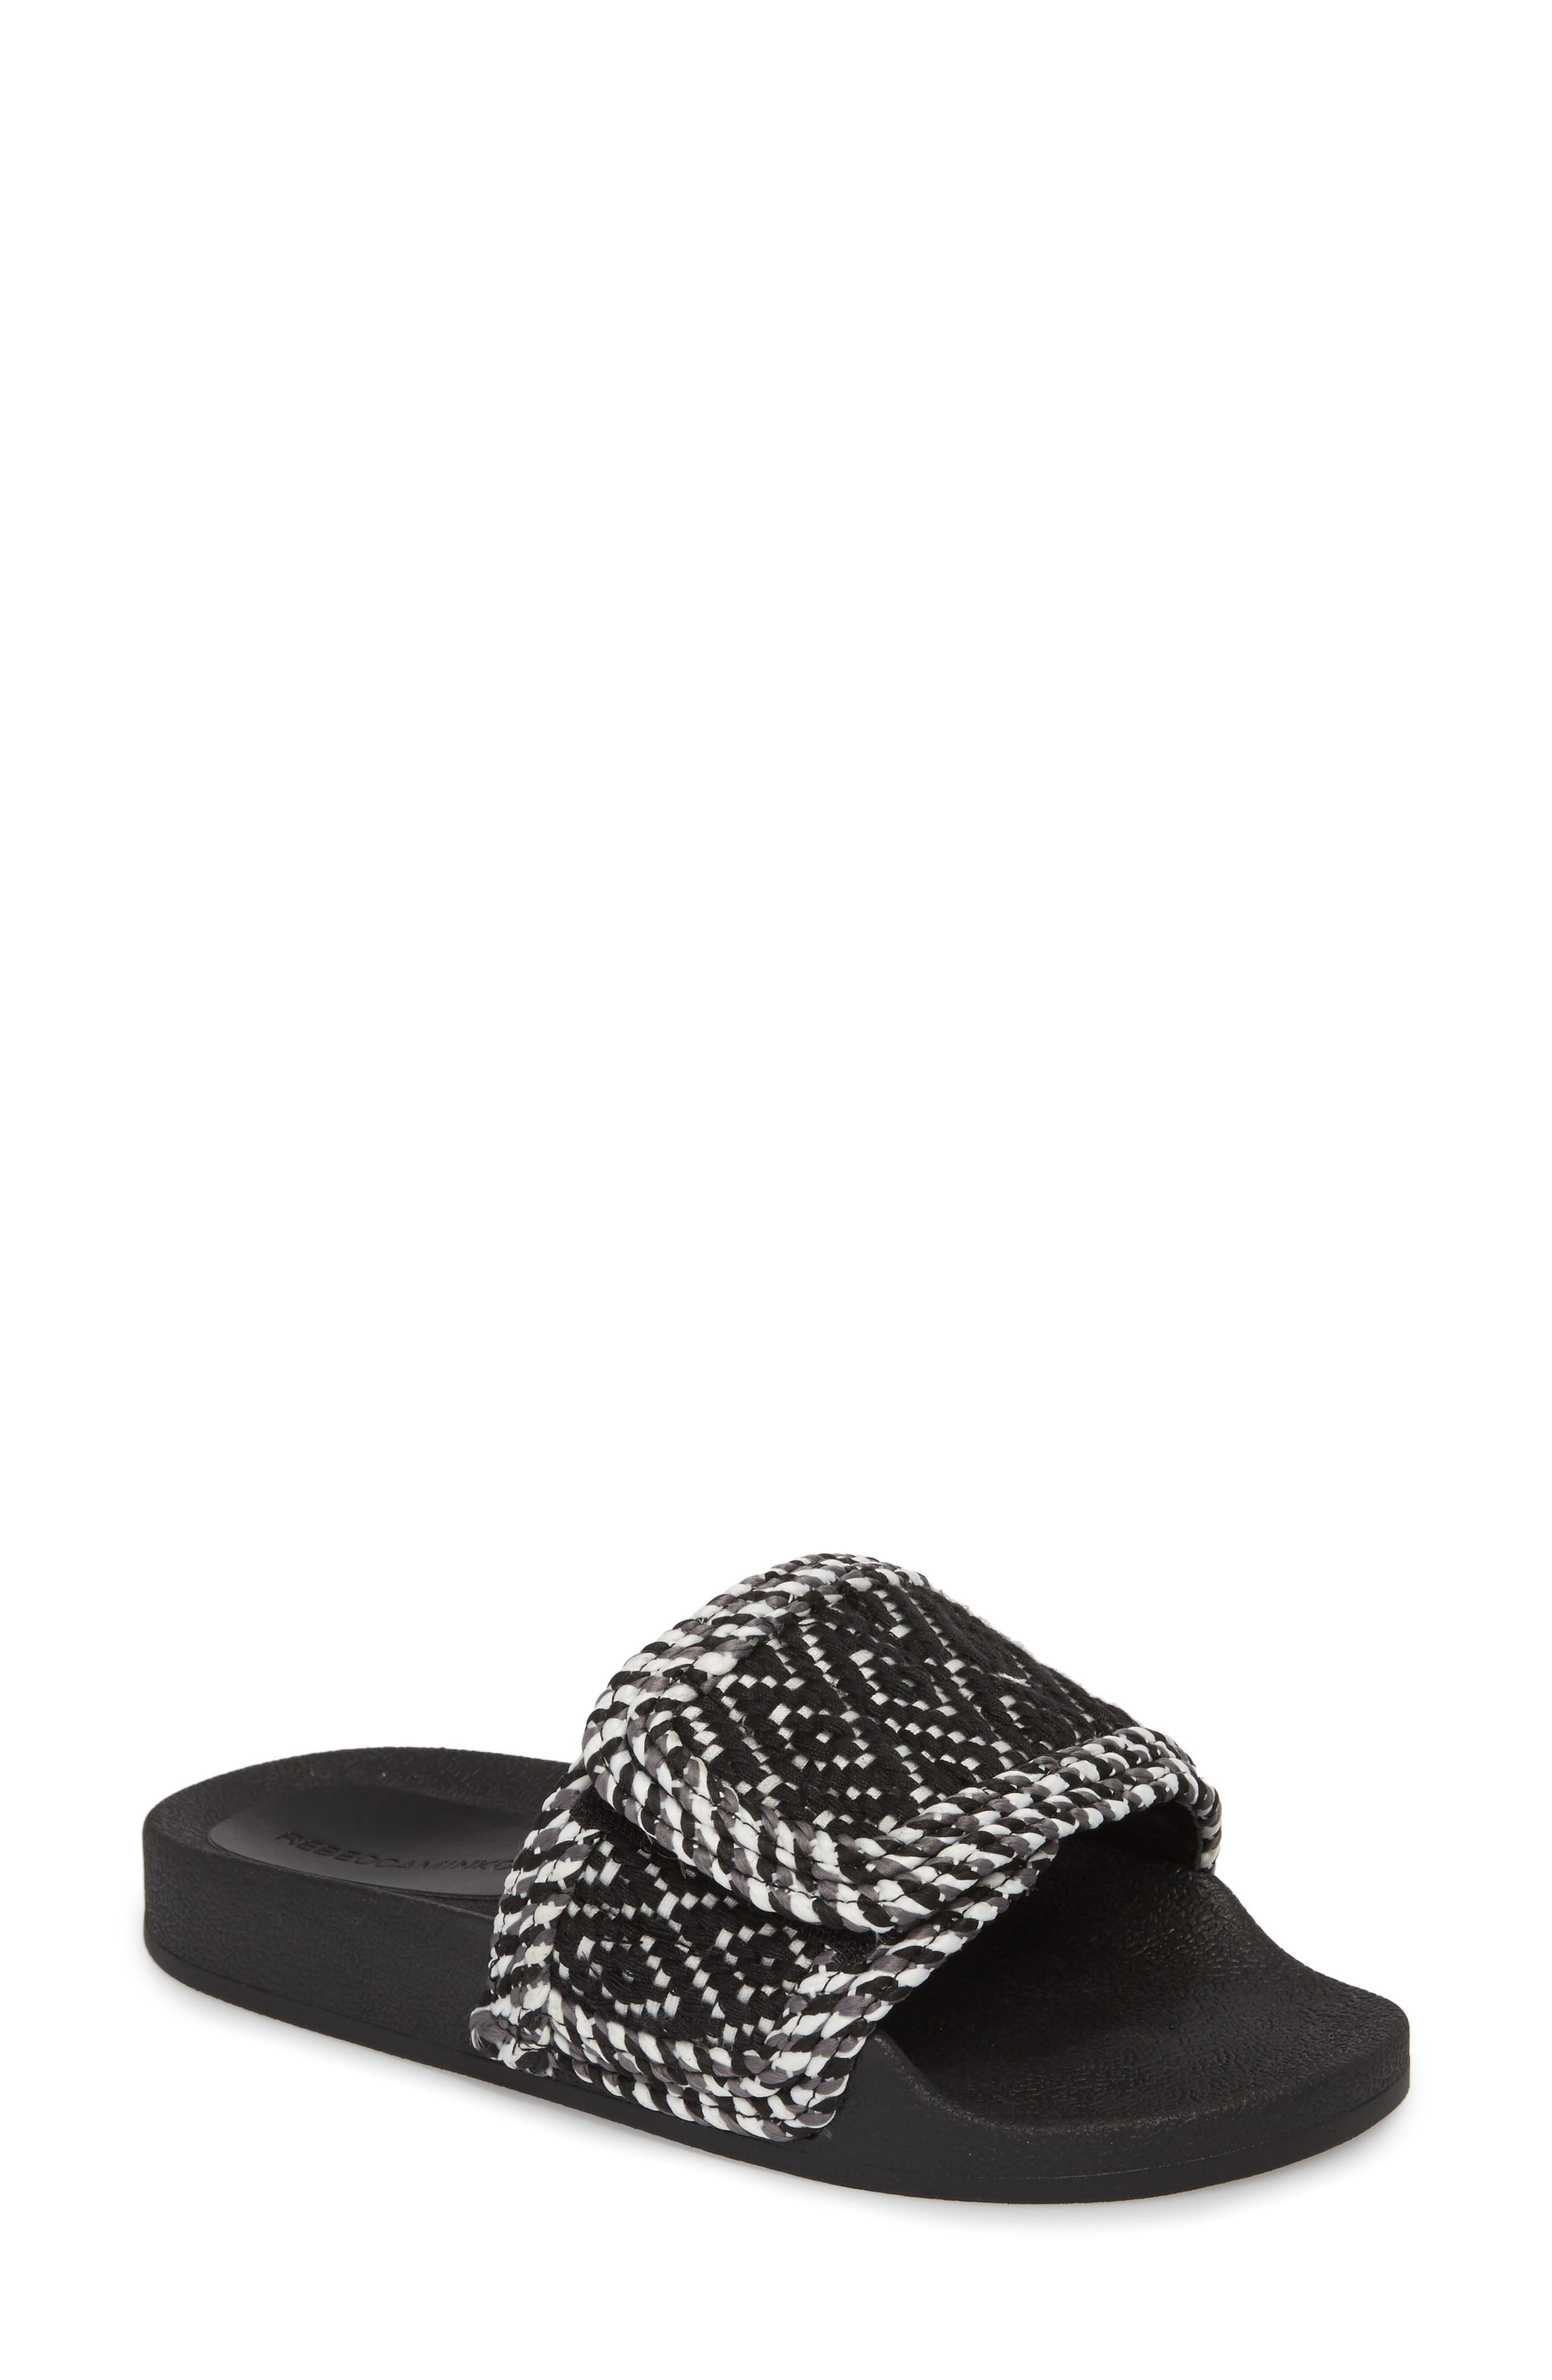 Tressa Woven Slide Sandal,                         Main,                         color, 004